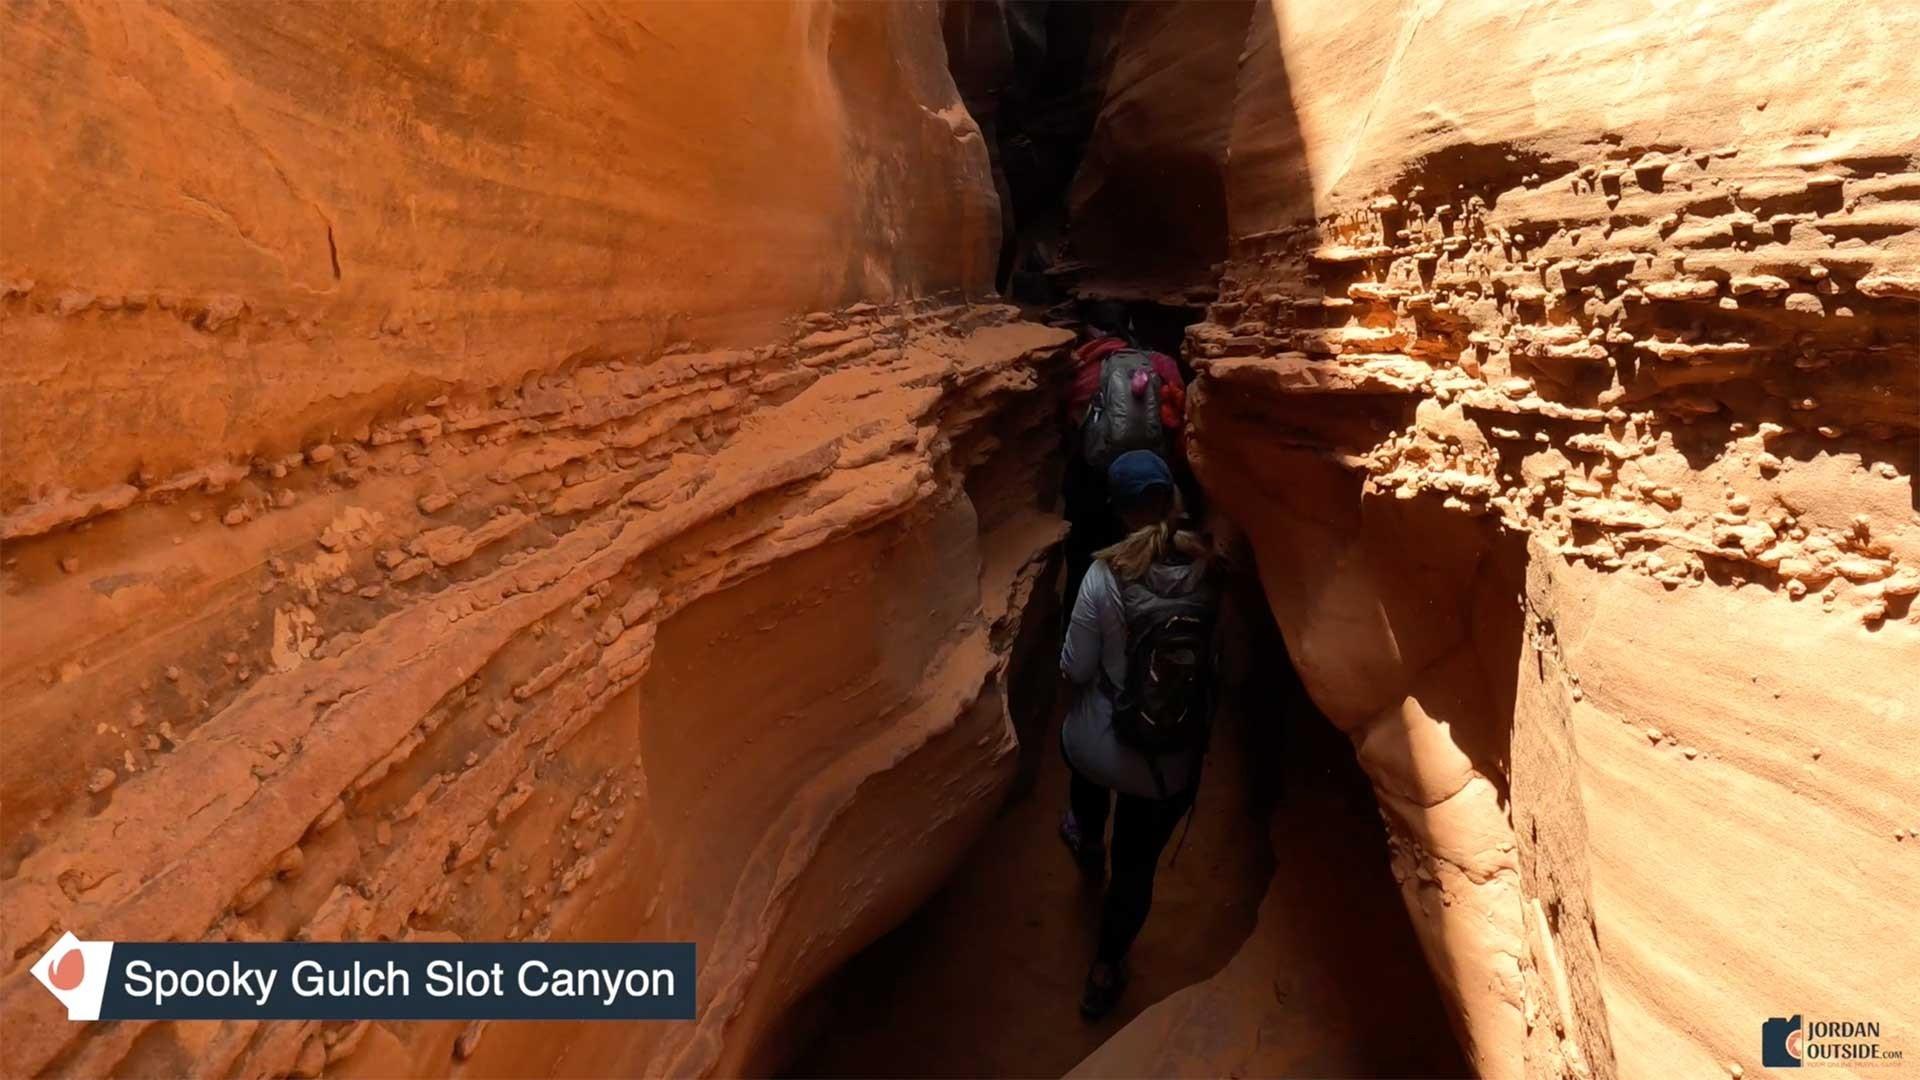 Entering Spooky Gulch Slot Canyon View